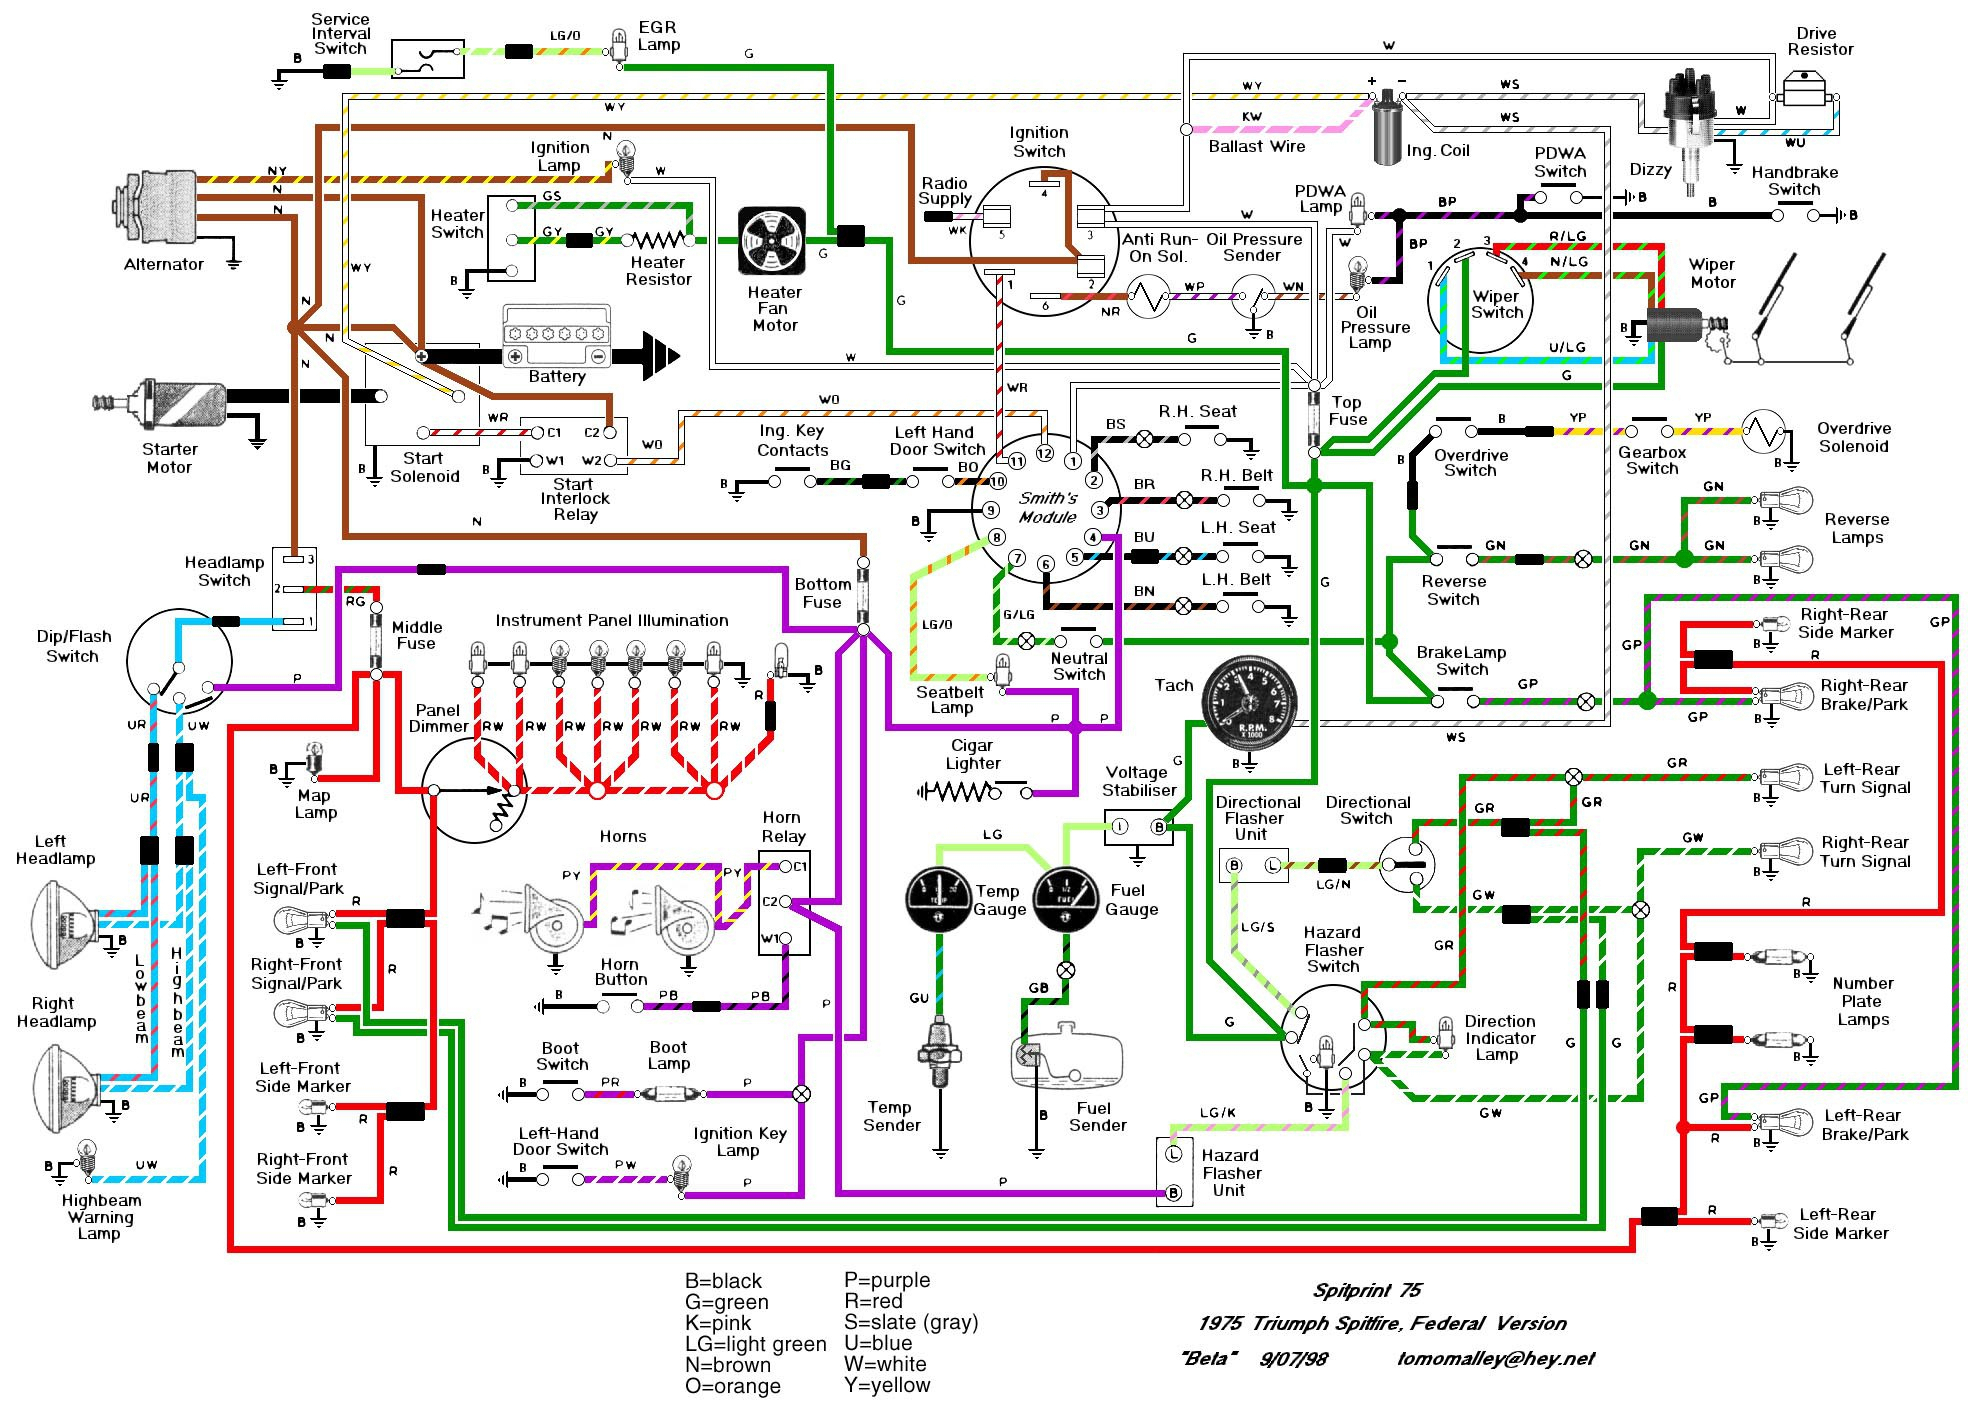 Ez Wiring Harness Cj5 | Wiring Diagram - Ez Wiring 21 Circuit Harness Diagram